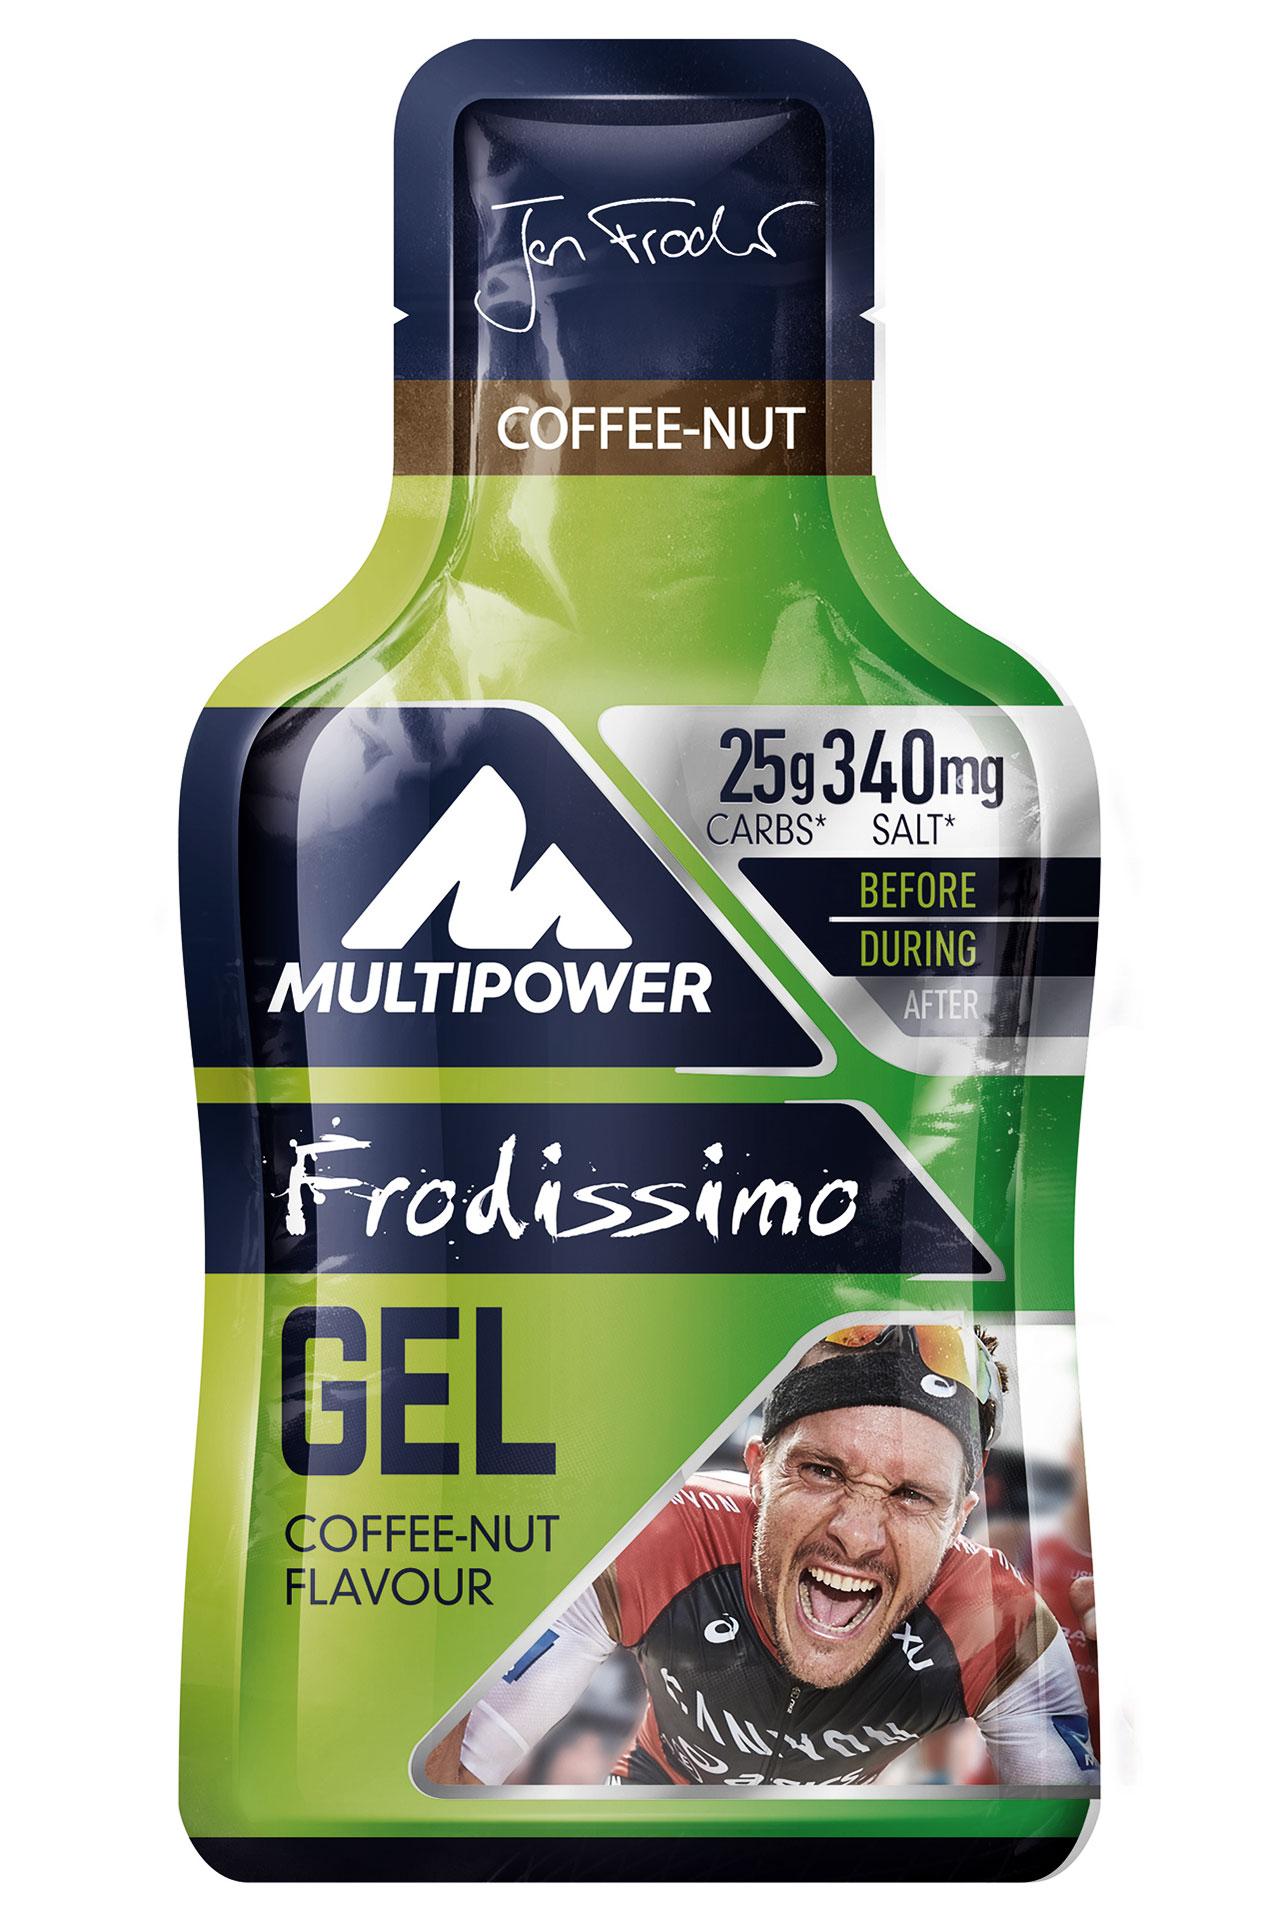 KOFFEIN IM BLUT Espresso to Ride - Multipower Gel Frodissimo Coffee Nut © Multipower